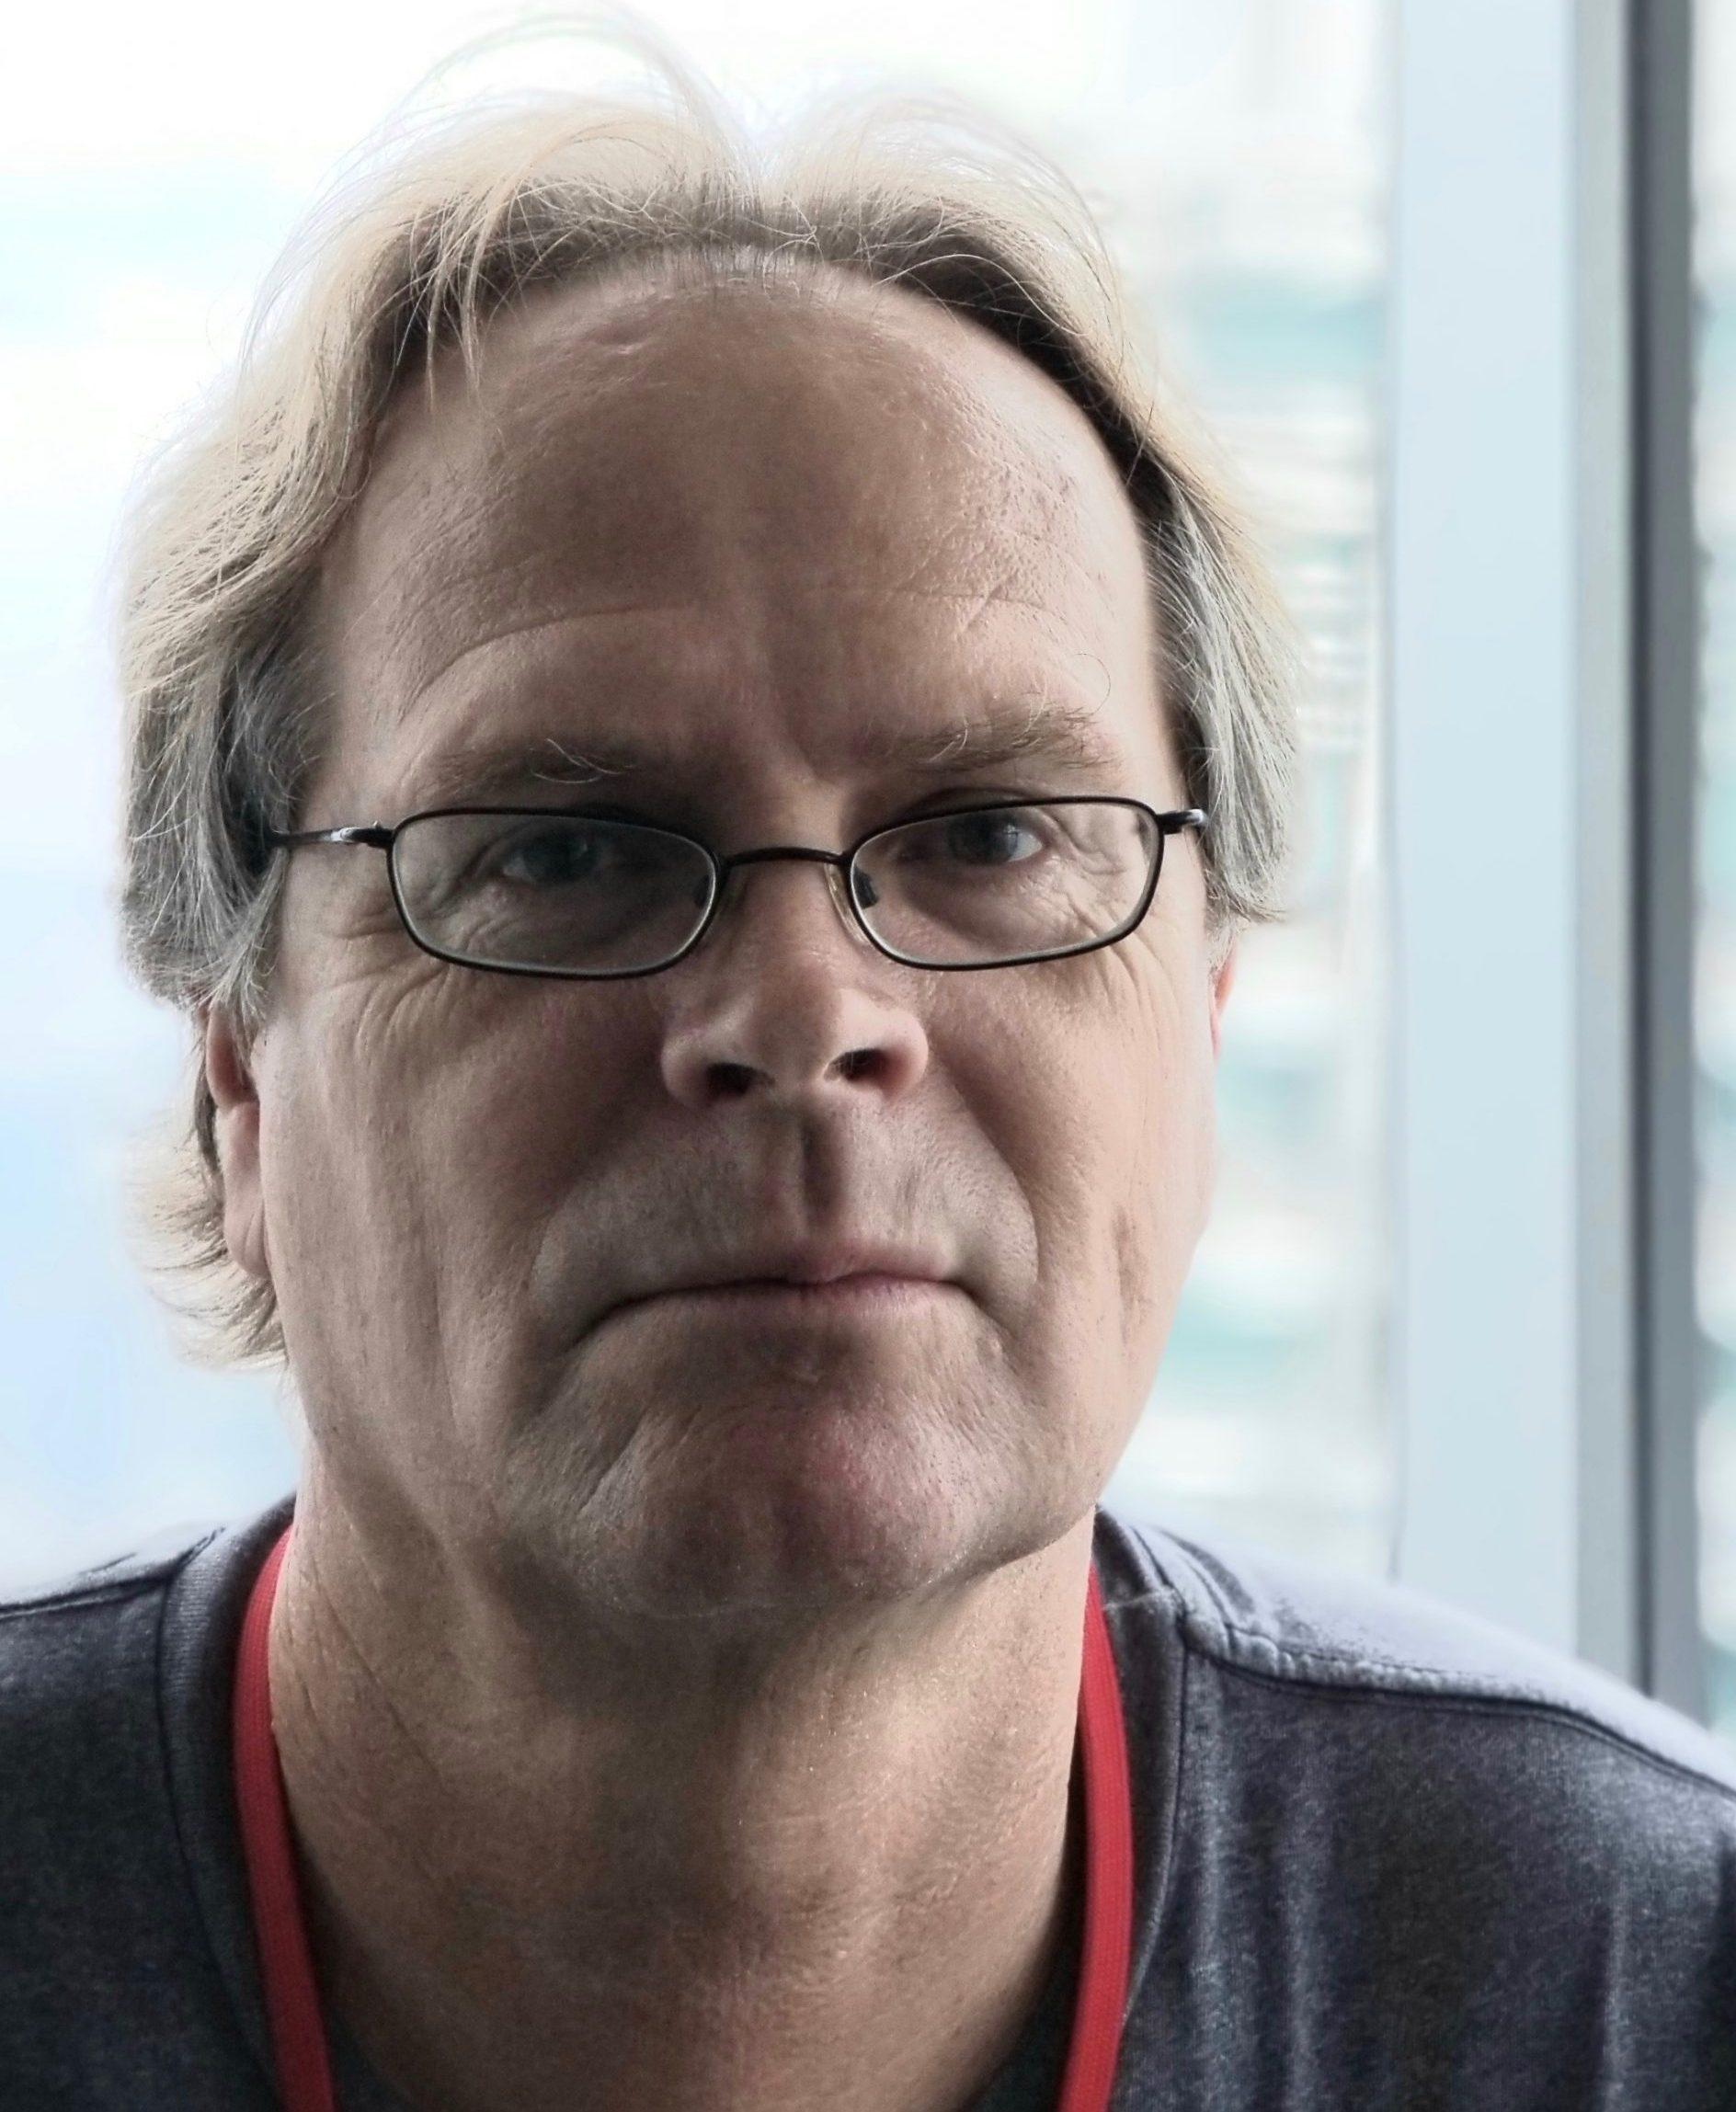 David Starkey, Director of Creative Writing at Santa Barbara City College